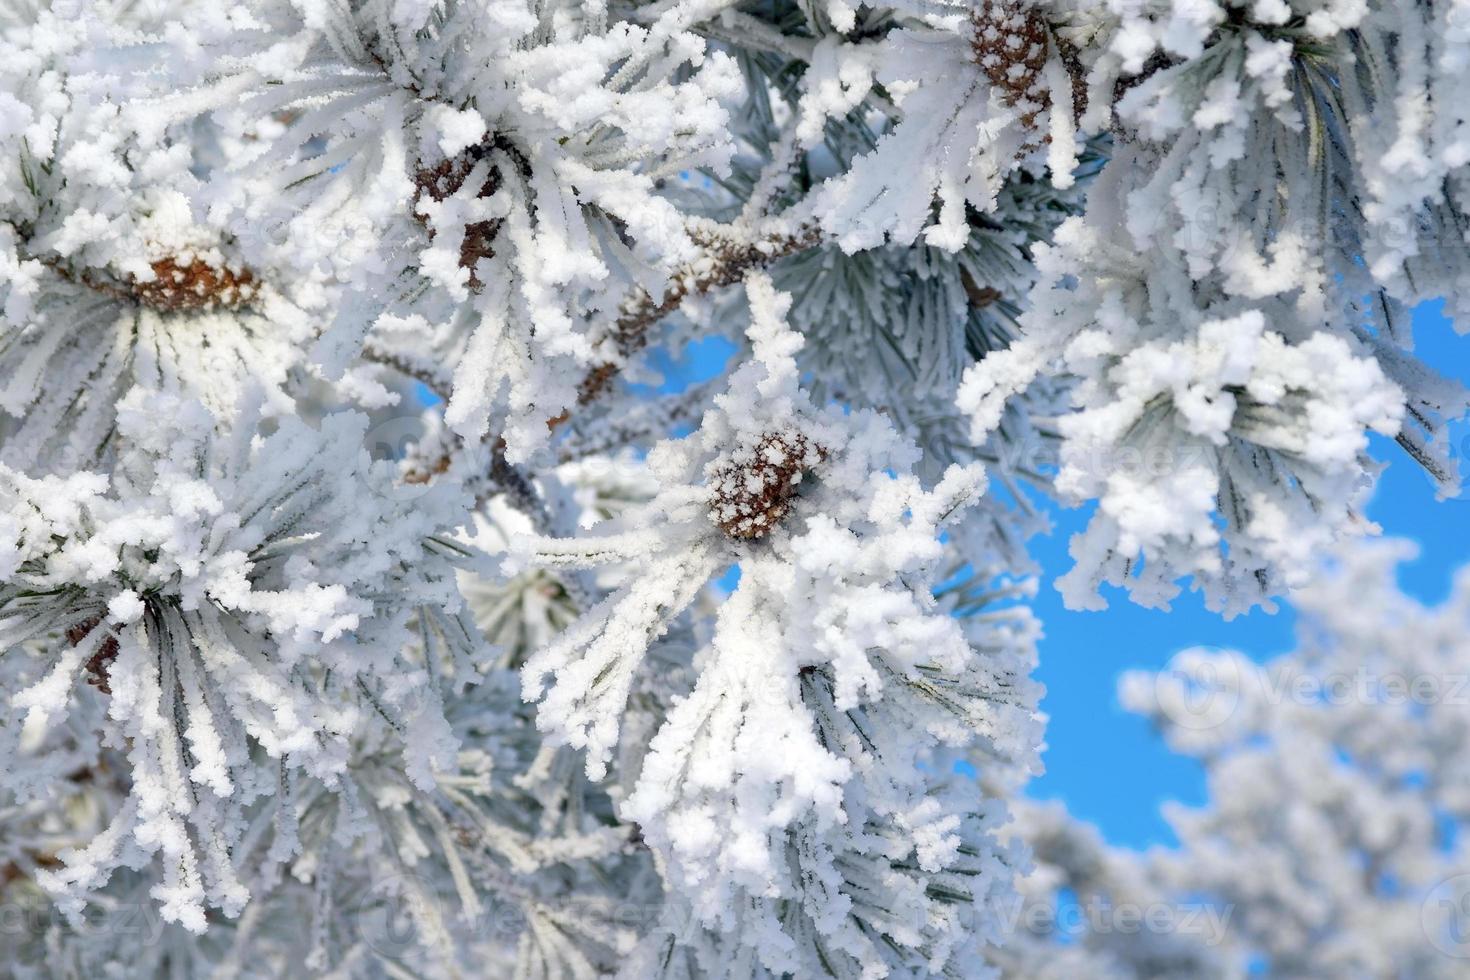 takjes dennen bedekt met sneeuw foto